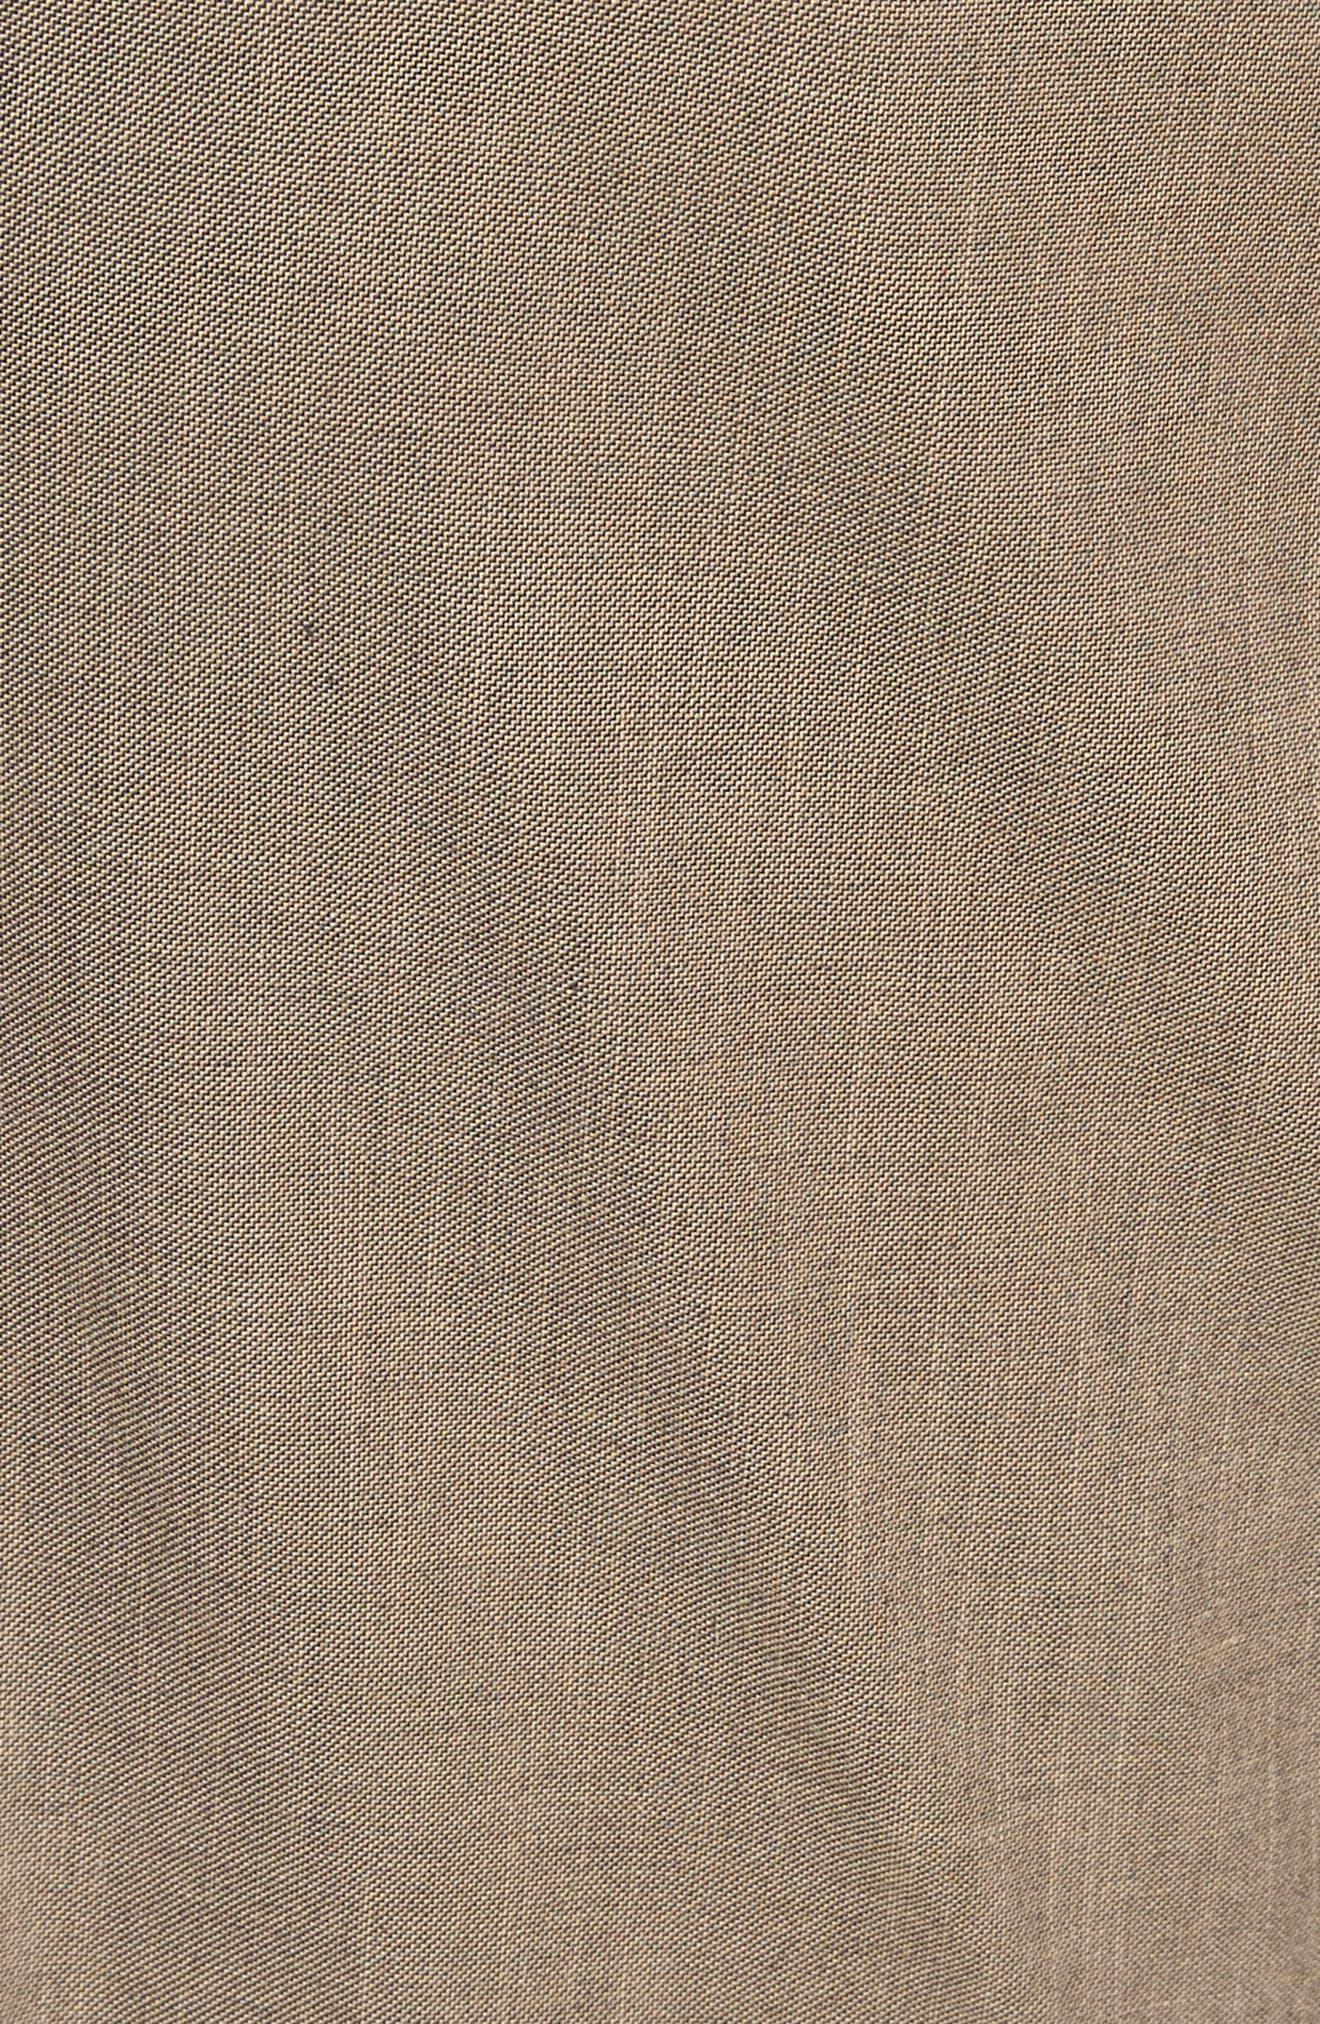 French Pocket Stretch Straight Leg Pants,                             Alternate thumbnail 2, color,                             251